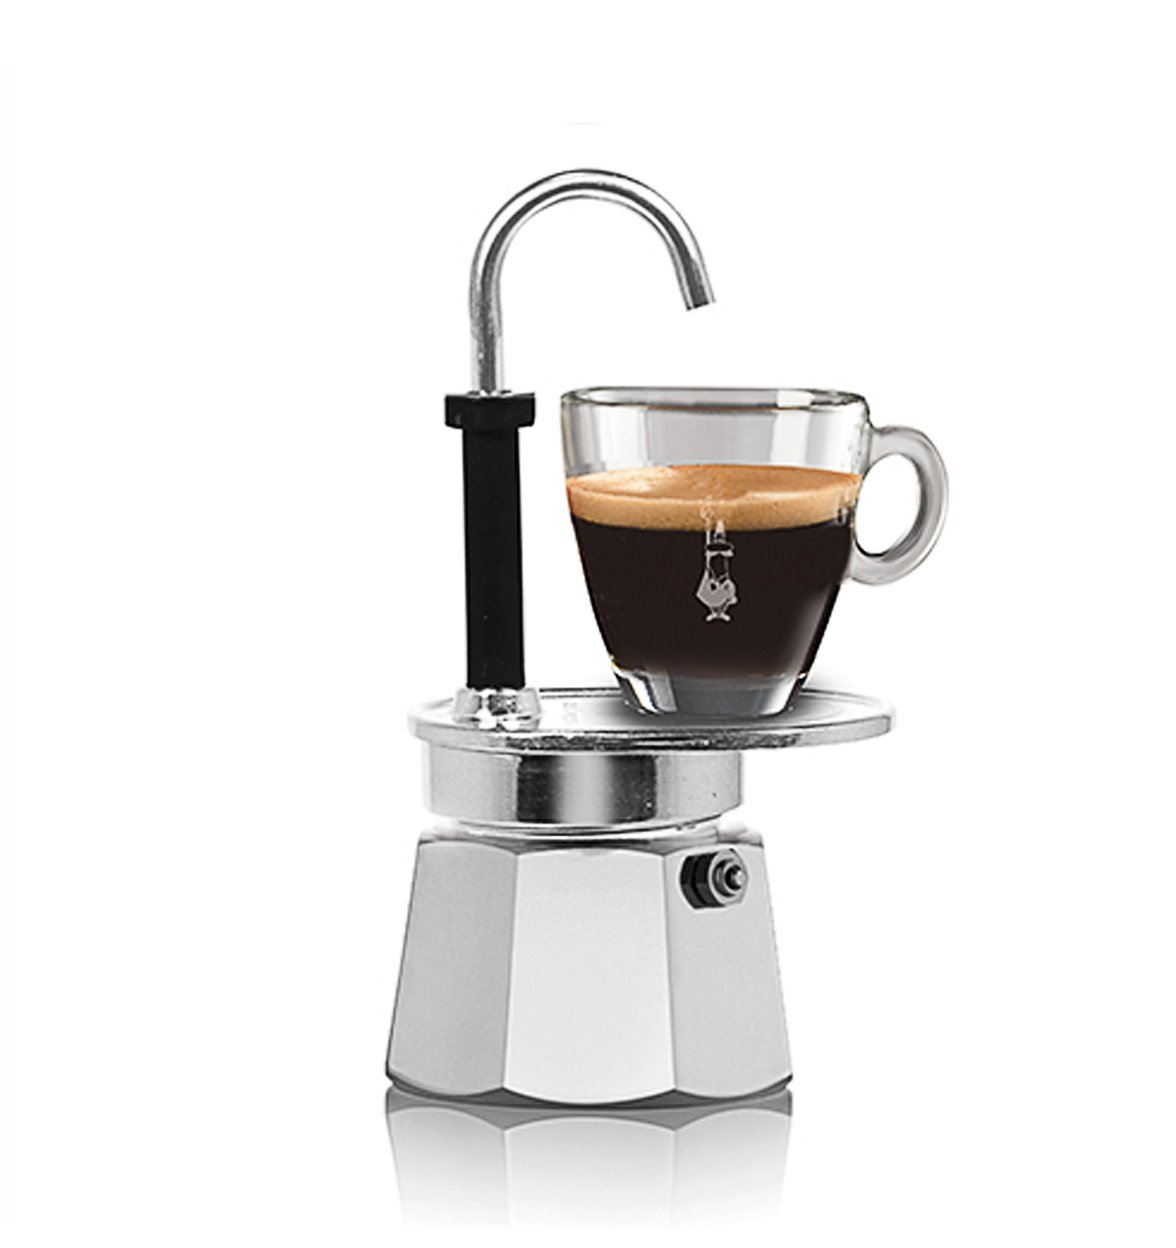 Mini Express cafetera Bialetti para 1 taza